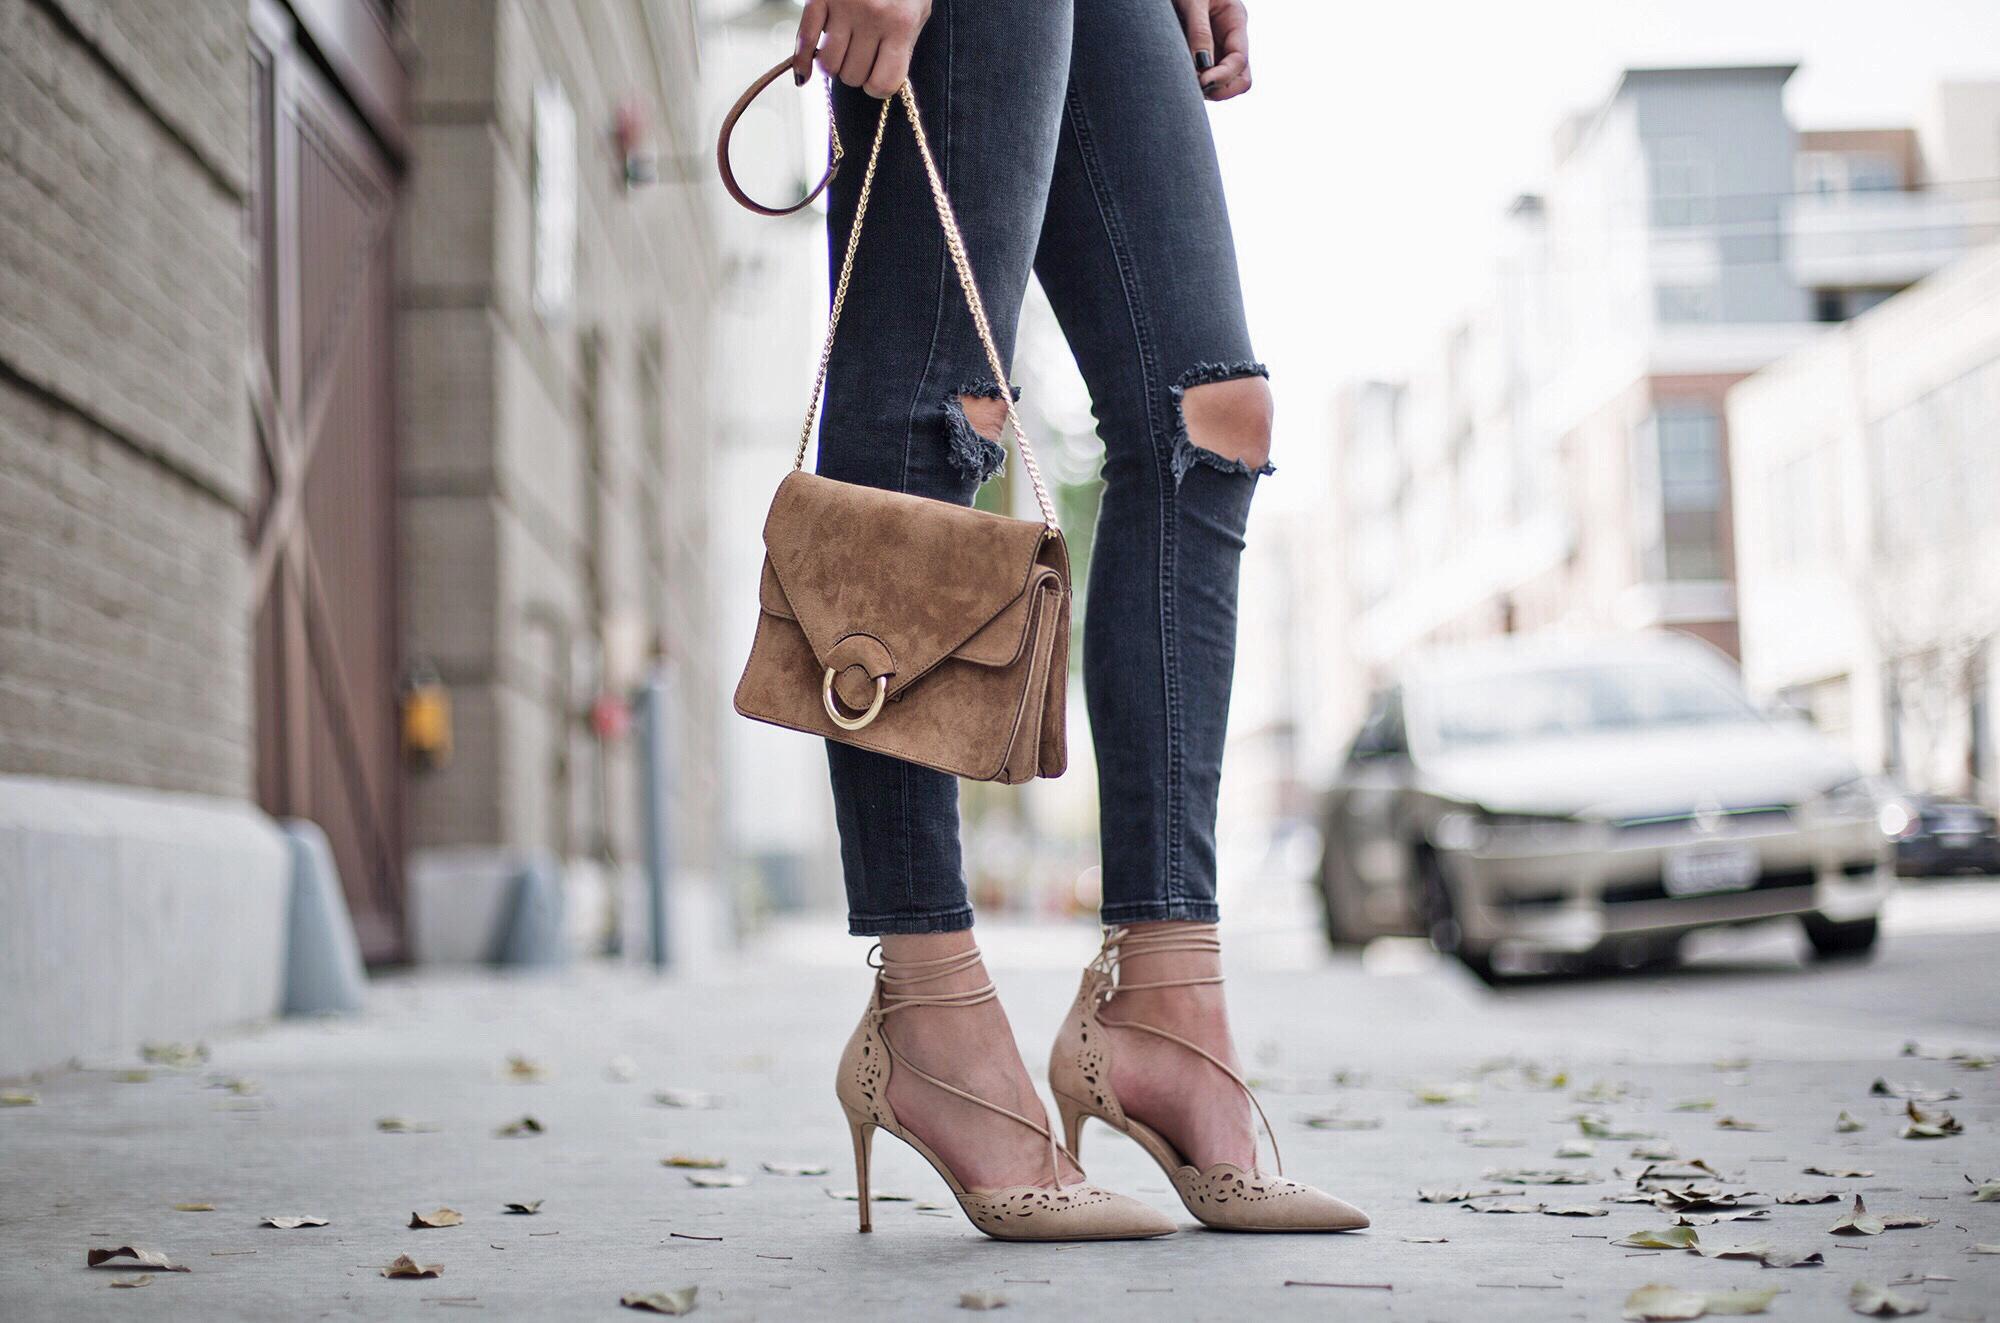 Nude Heels And Bag